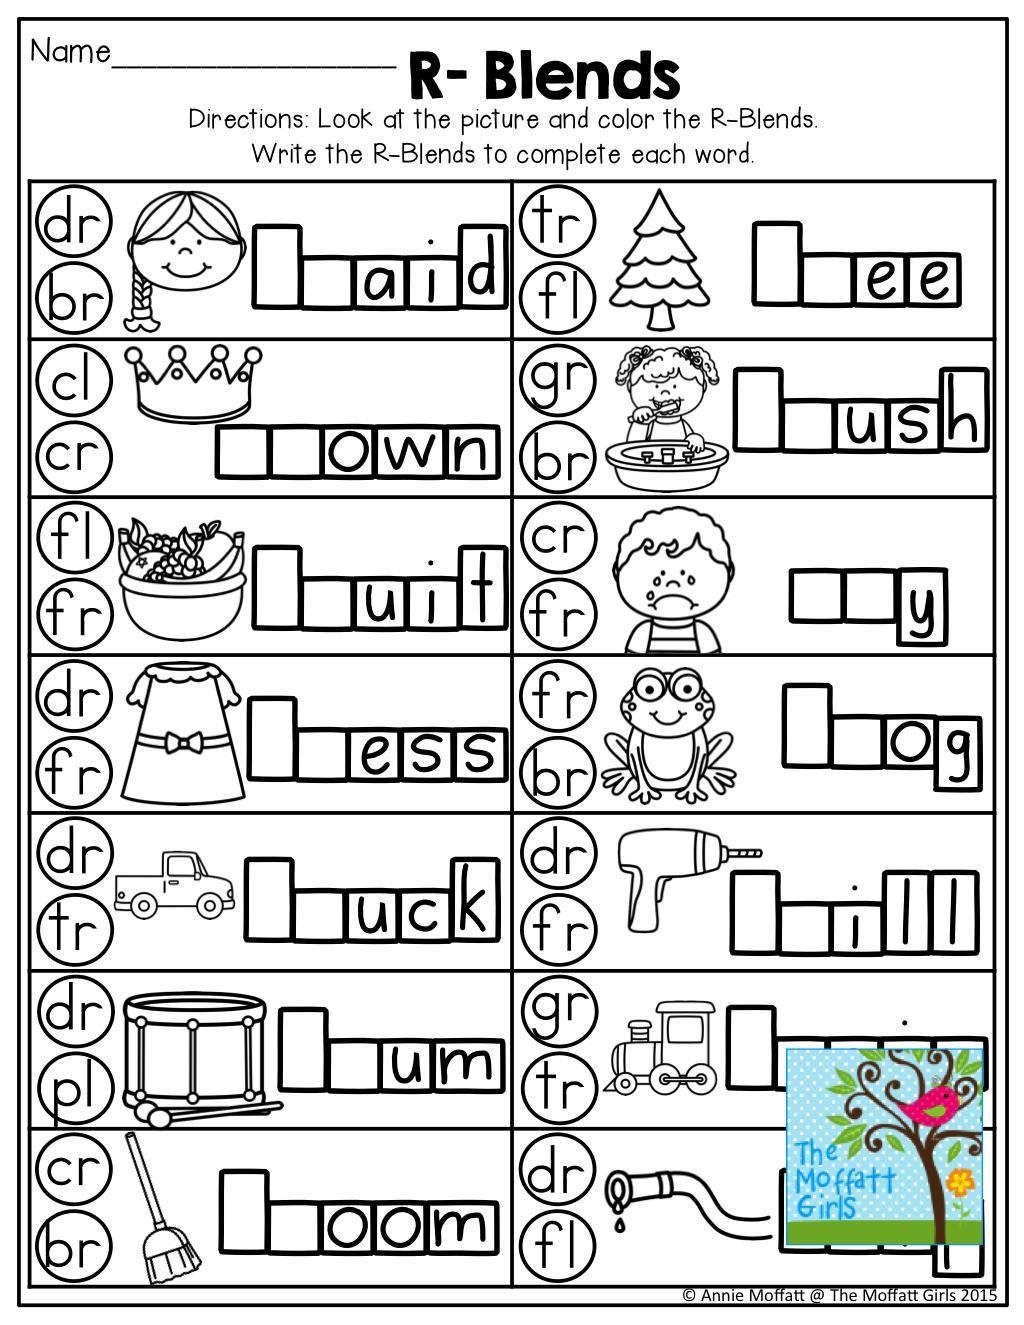 18 Printable Worksheets Blending Sounds Blends Worksheets Blends Activities Phonics Reading [ 1325 x 1024 Pixel ]